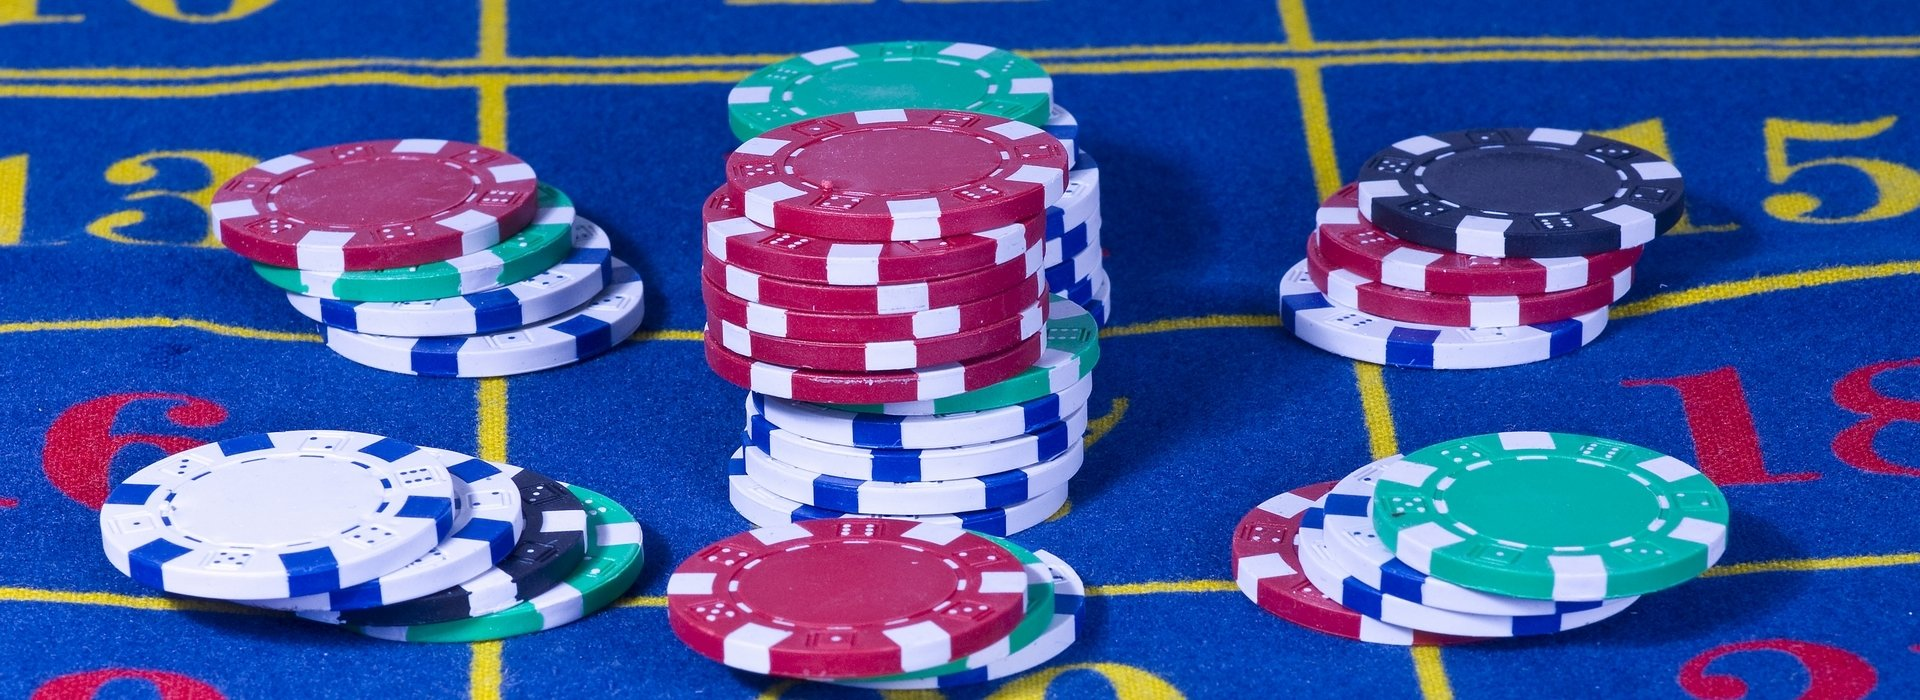 Top Budapest Casinos